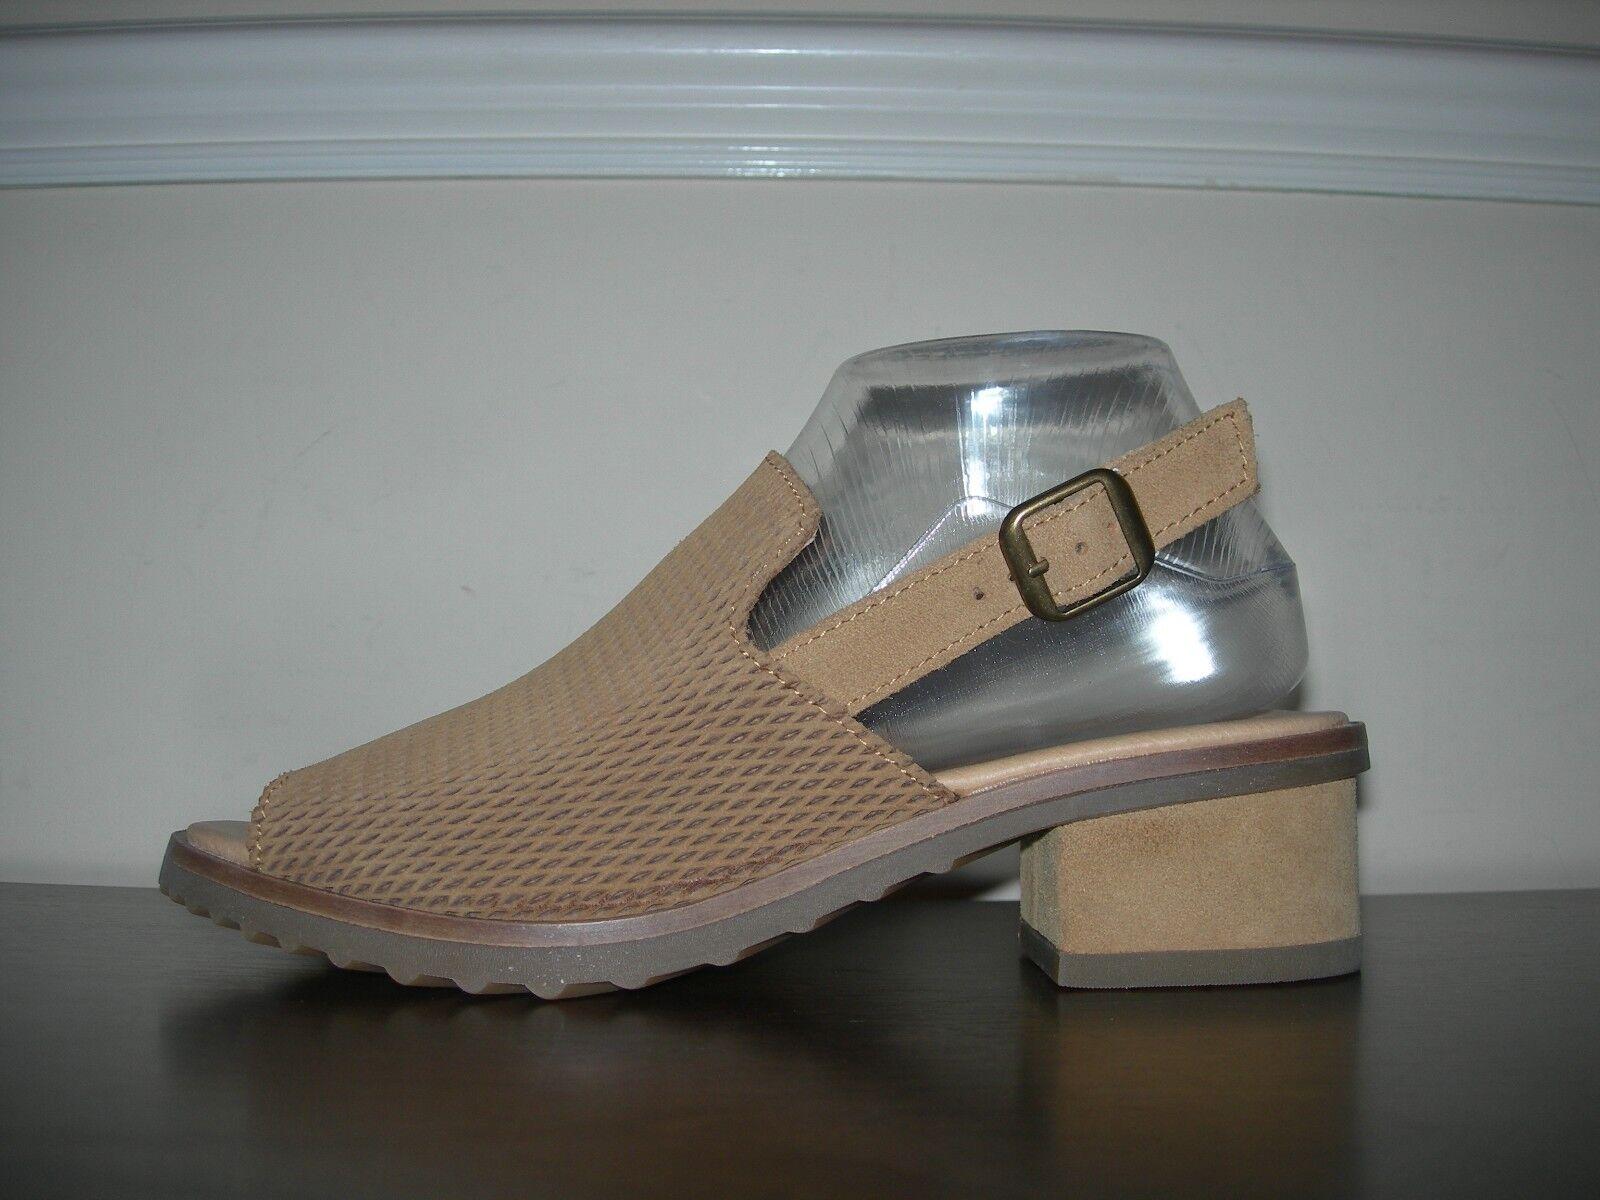 EL NATURALISTA WOMEN'S Schuhe SANDALS OPEN TOES 100% LEATHER EU 39 / UK 6 SLIM